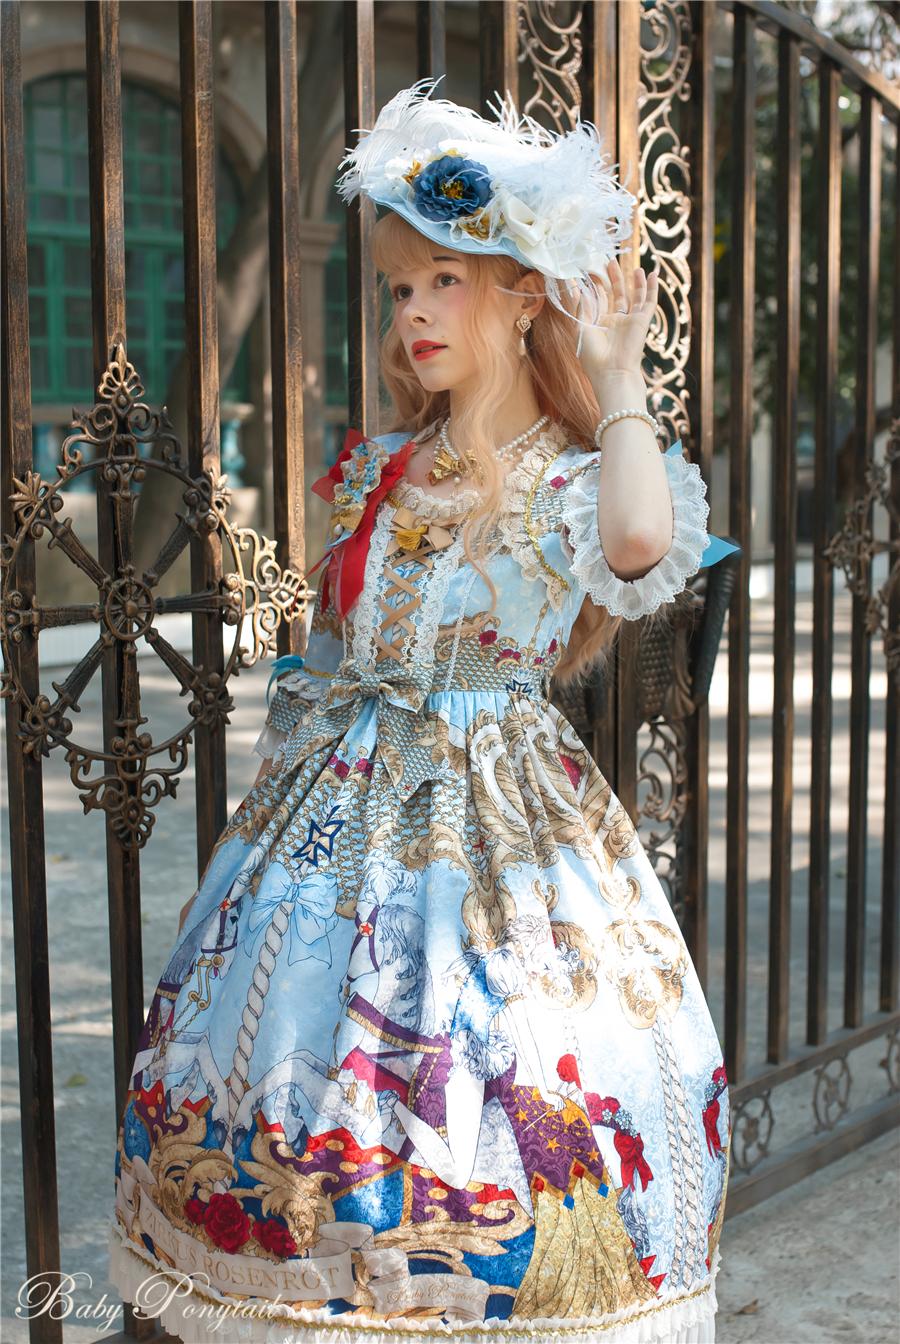 Baby Ponytail_Circus Princess_Sax OP_Claudia_13.jpg